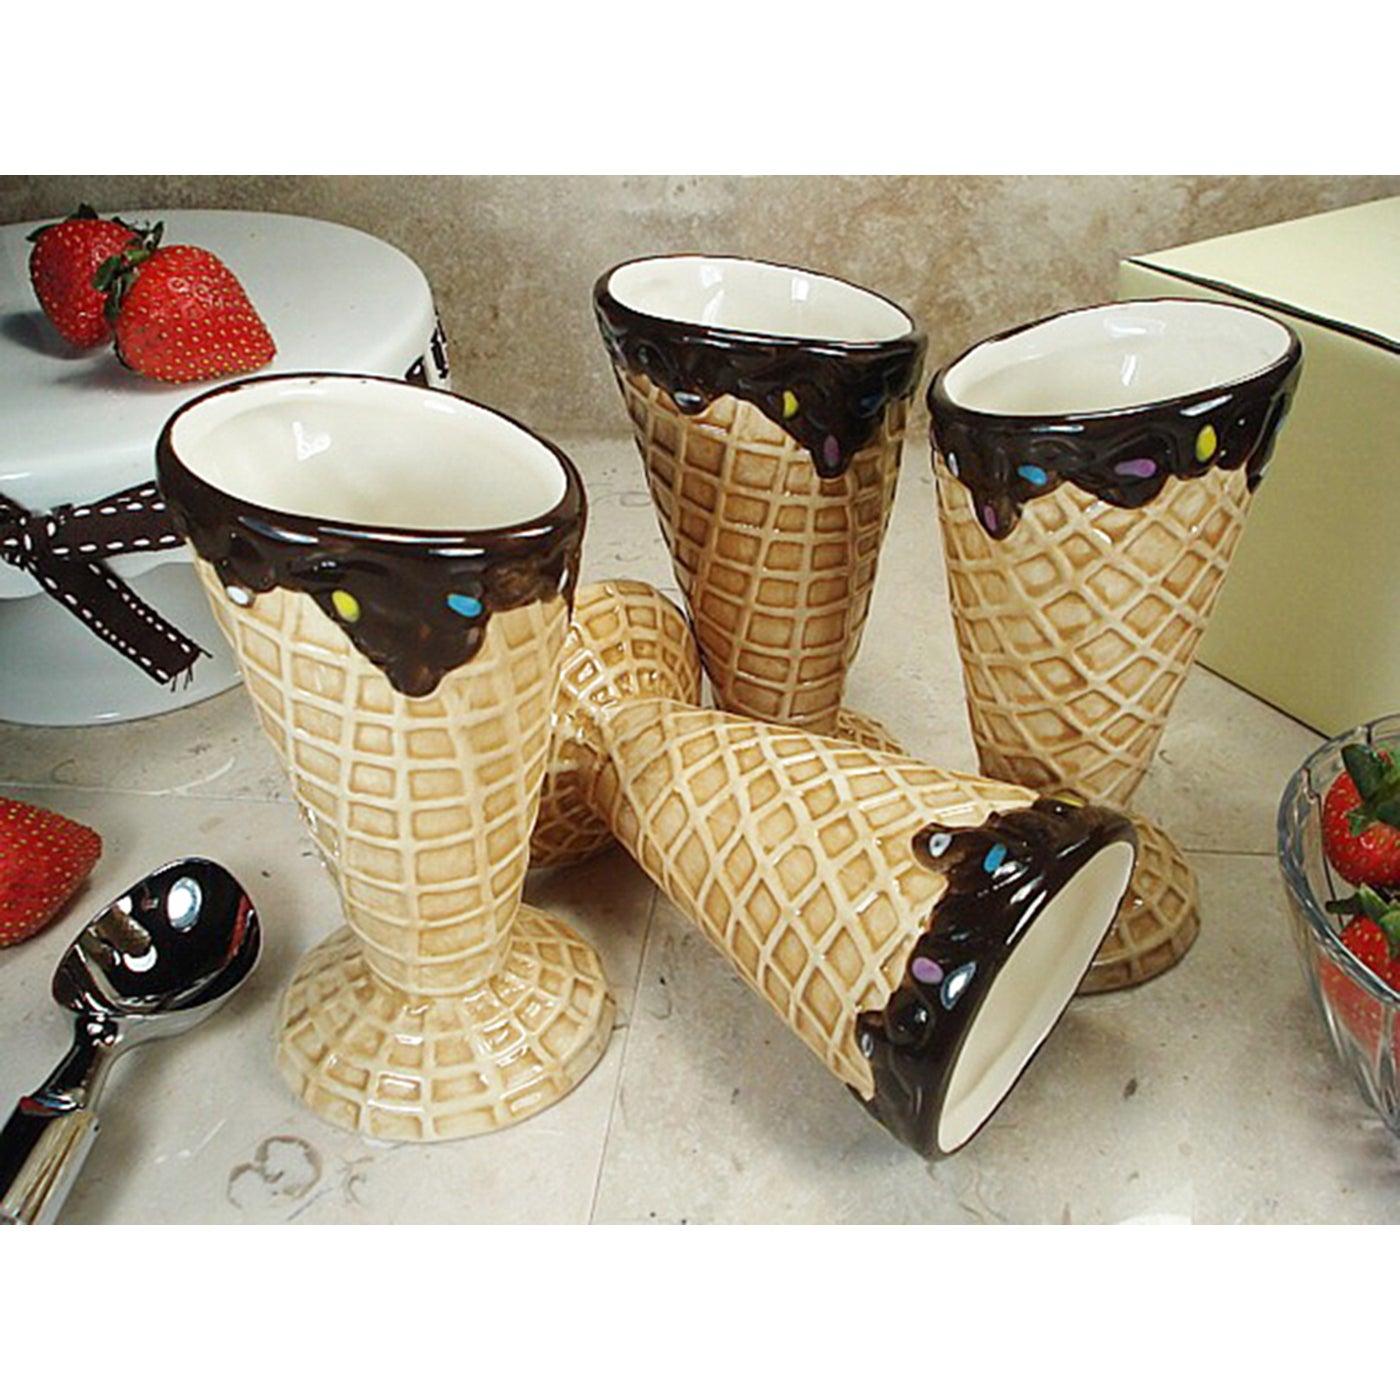 Lusso D'Lusso Designs Four Piece Waffle Cone Design Ceram...